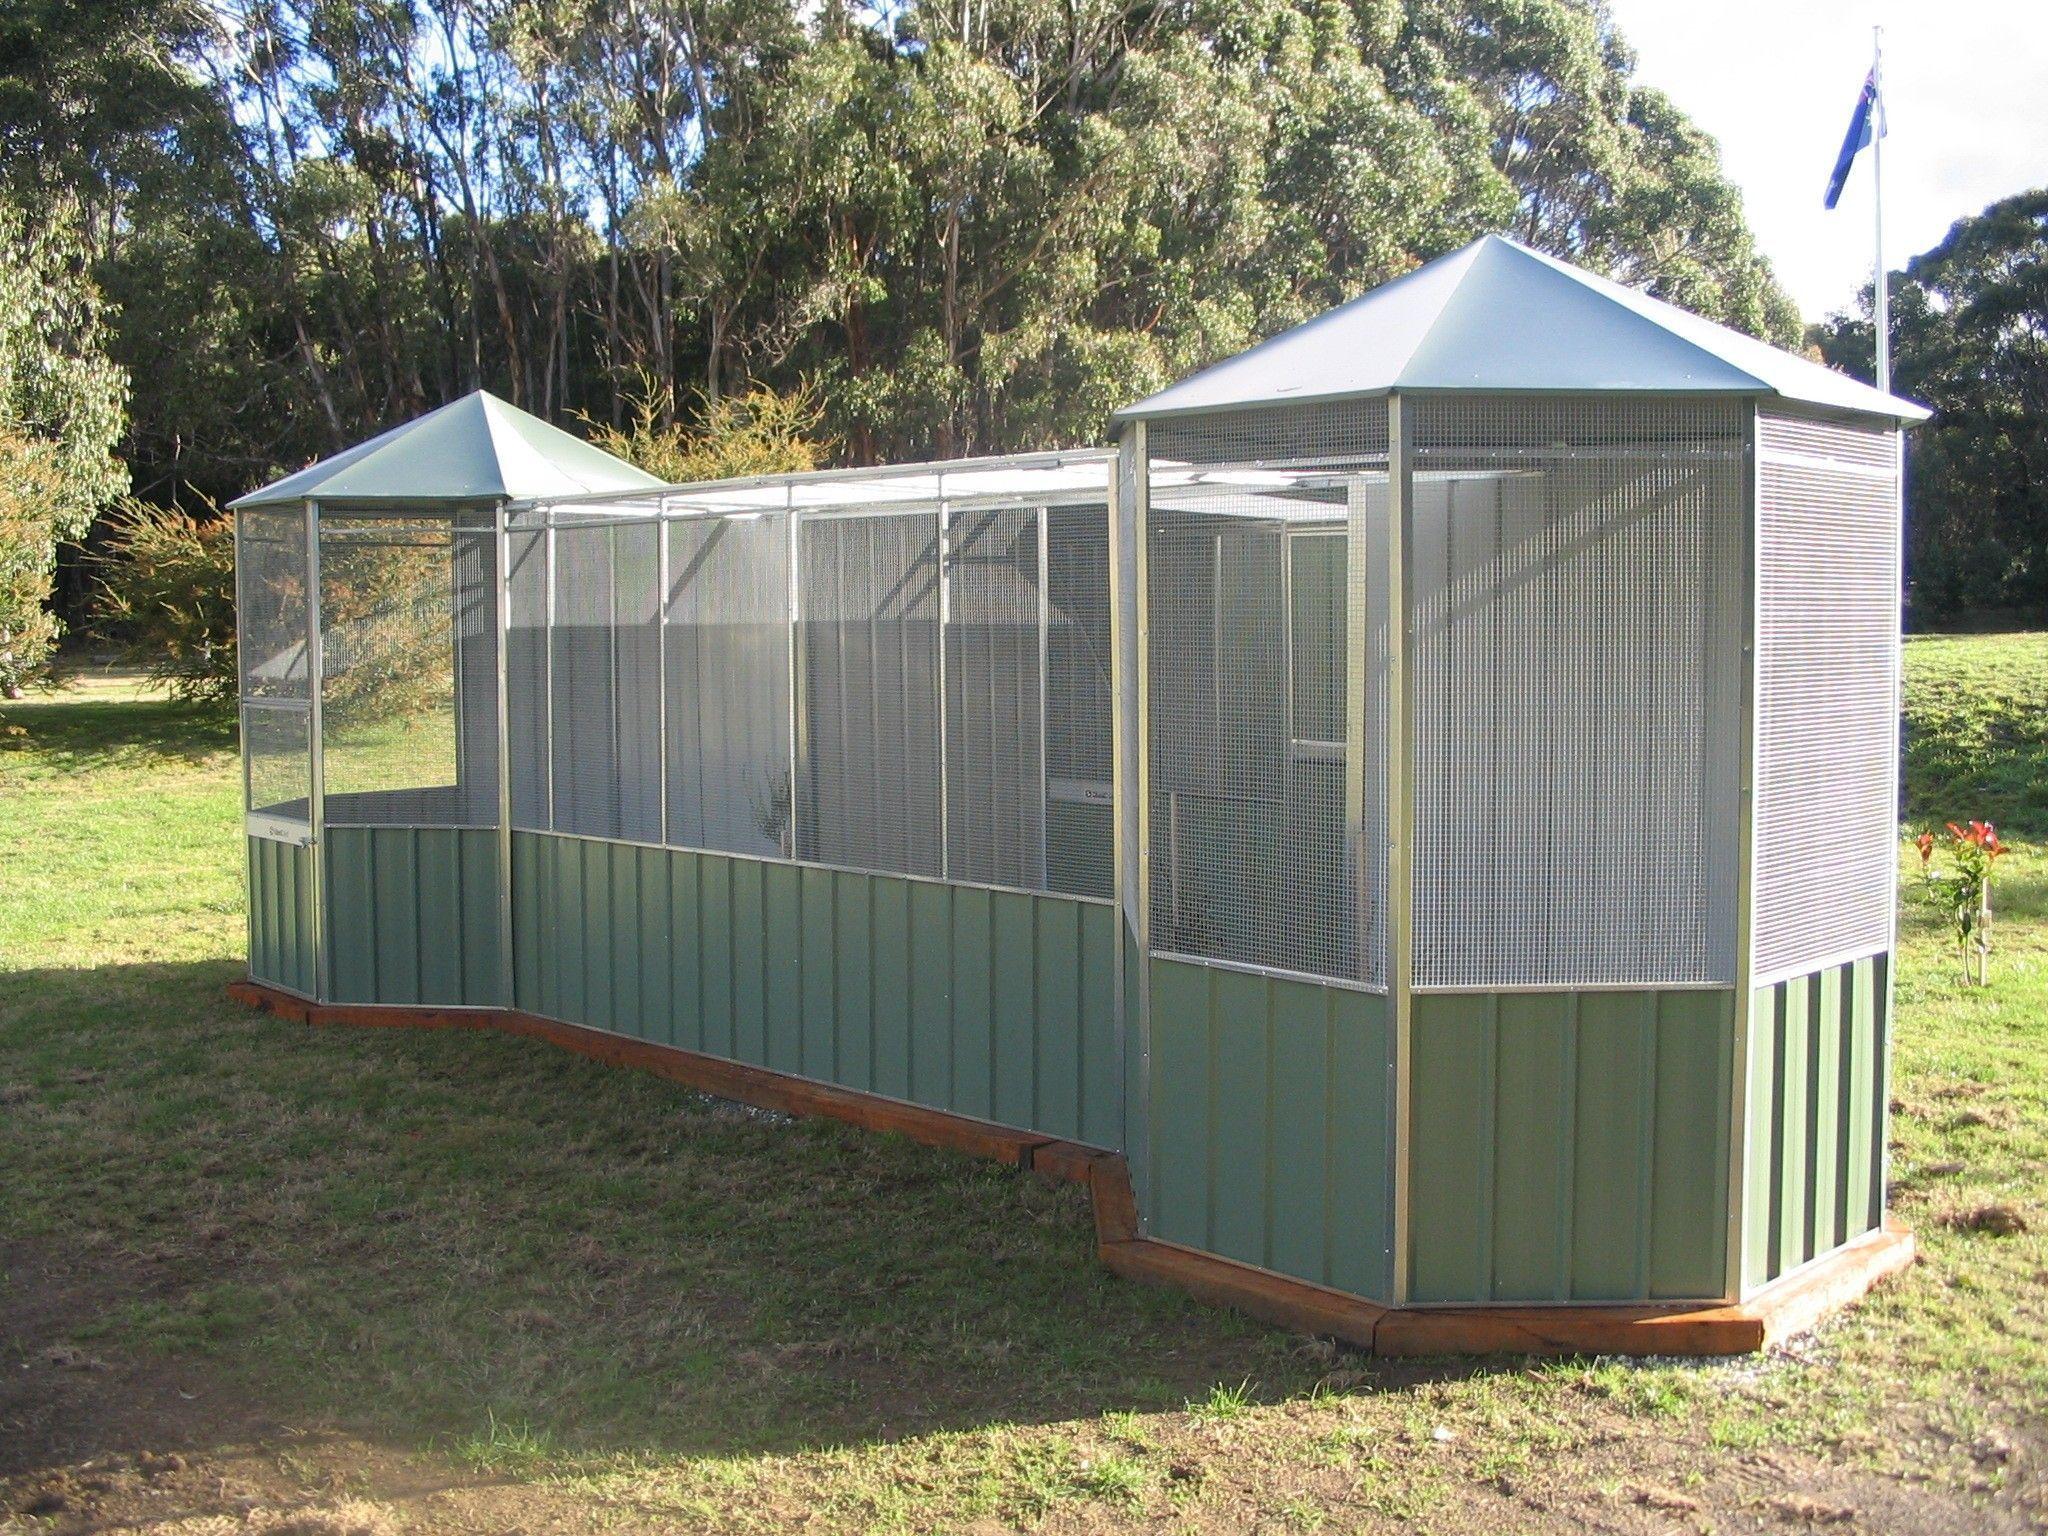 walk in bird aviary for sale1 #aviariesideas #aviariesdiy | Build ...